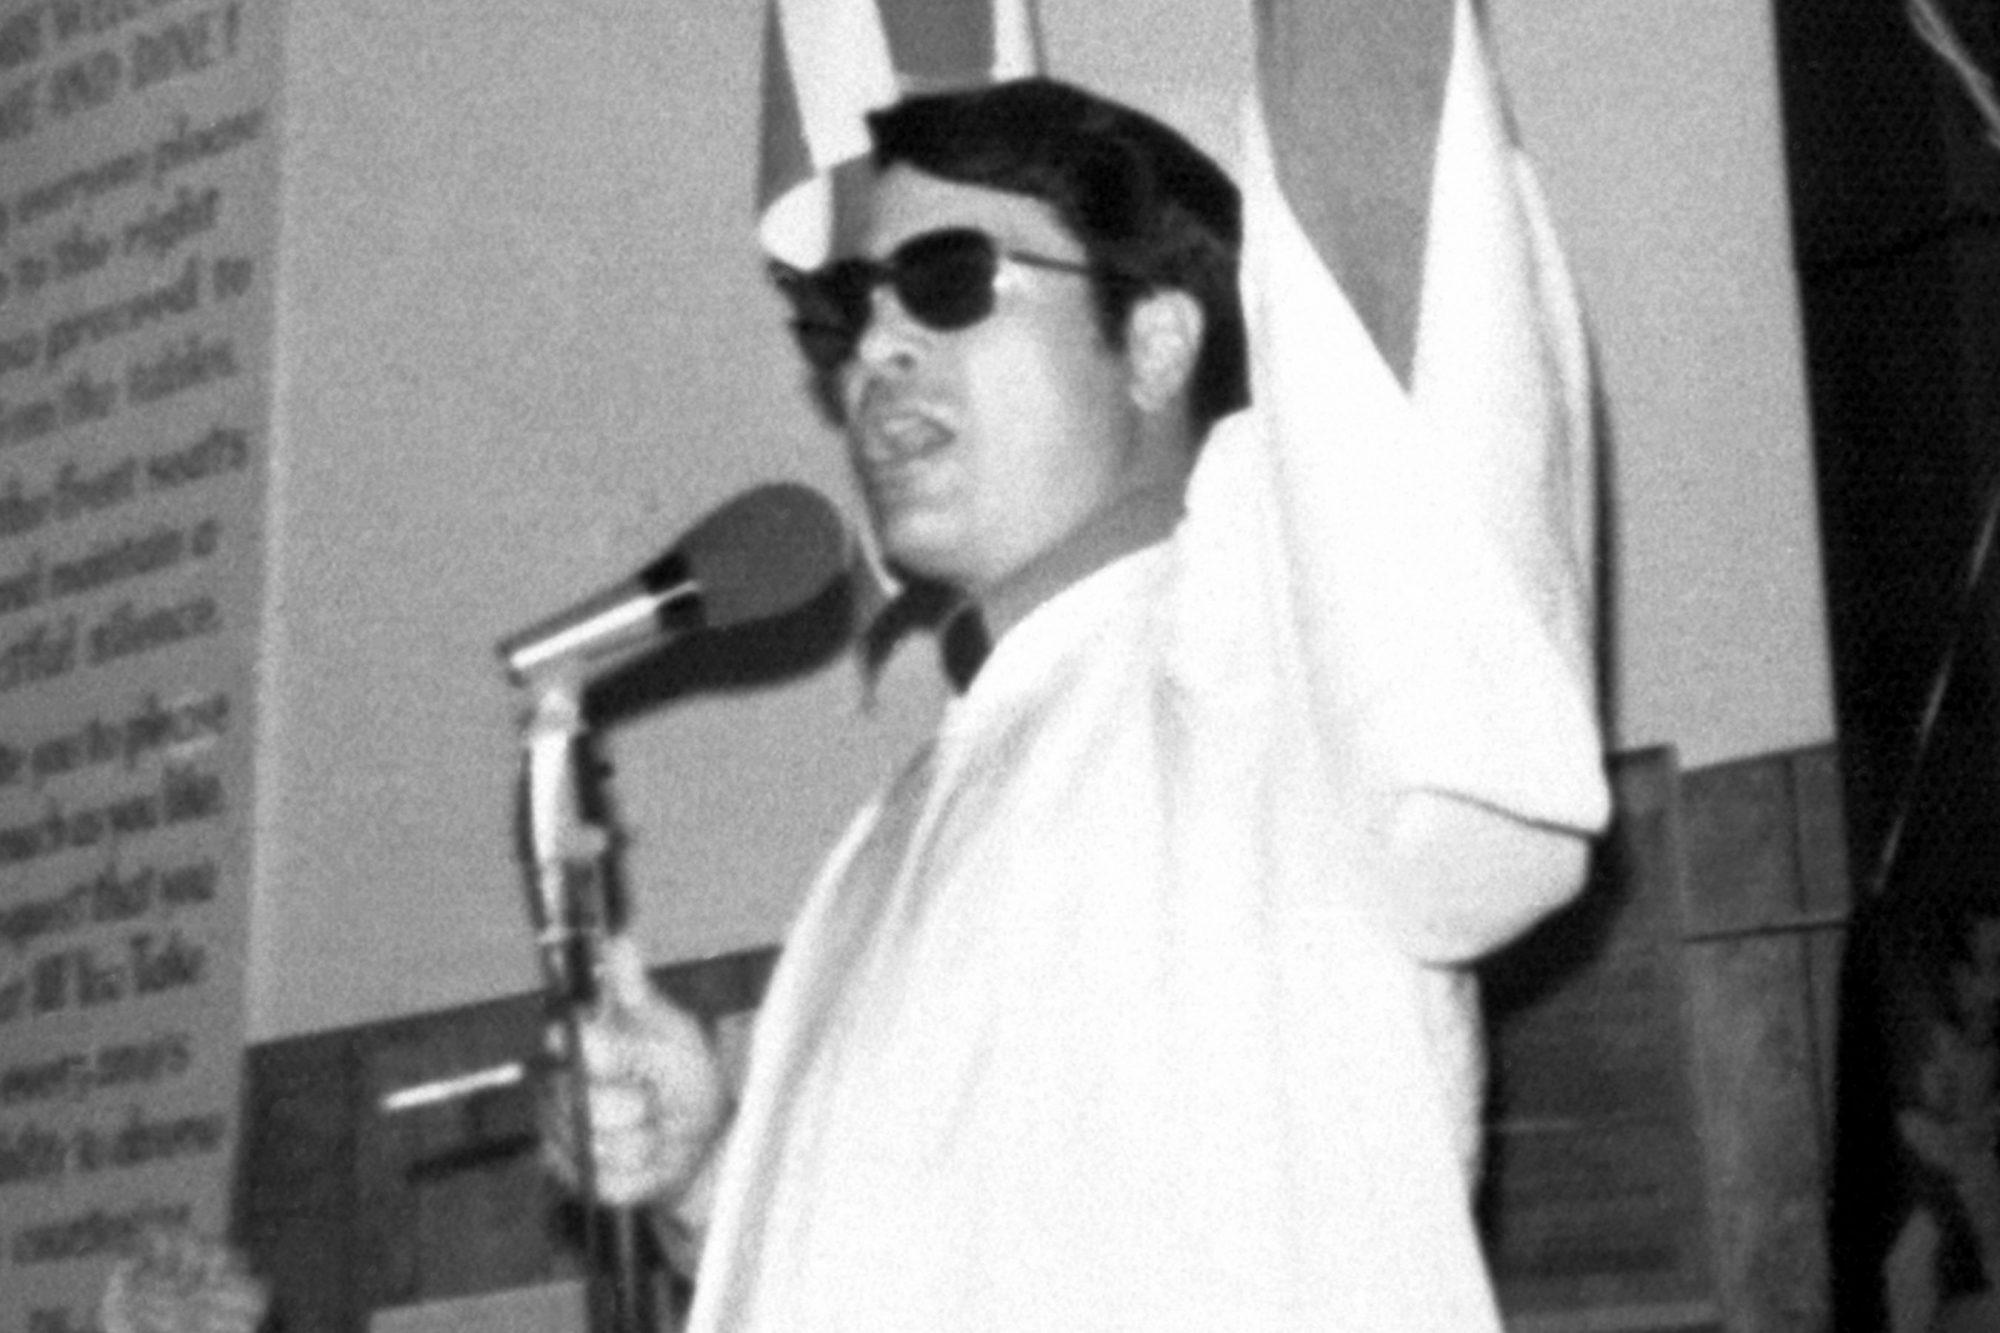 Reverend Jim Jones Raising His Fist